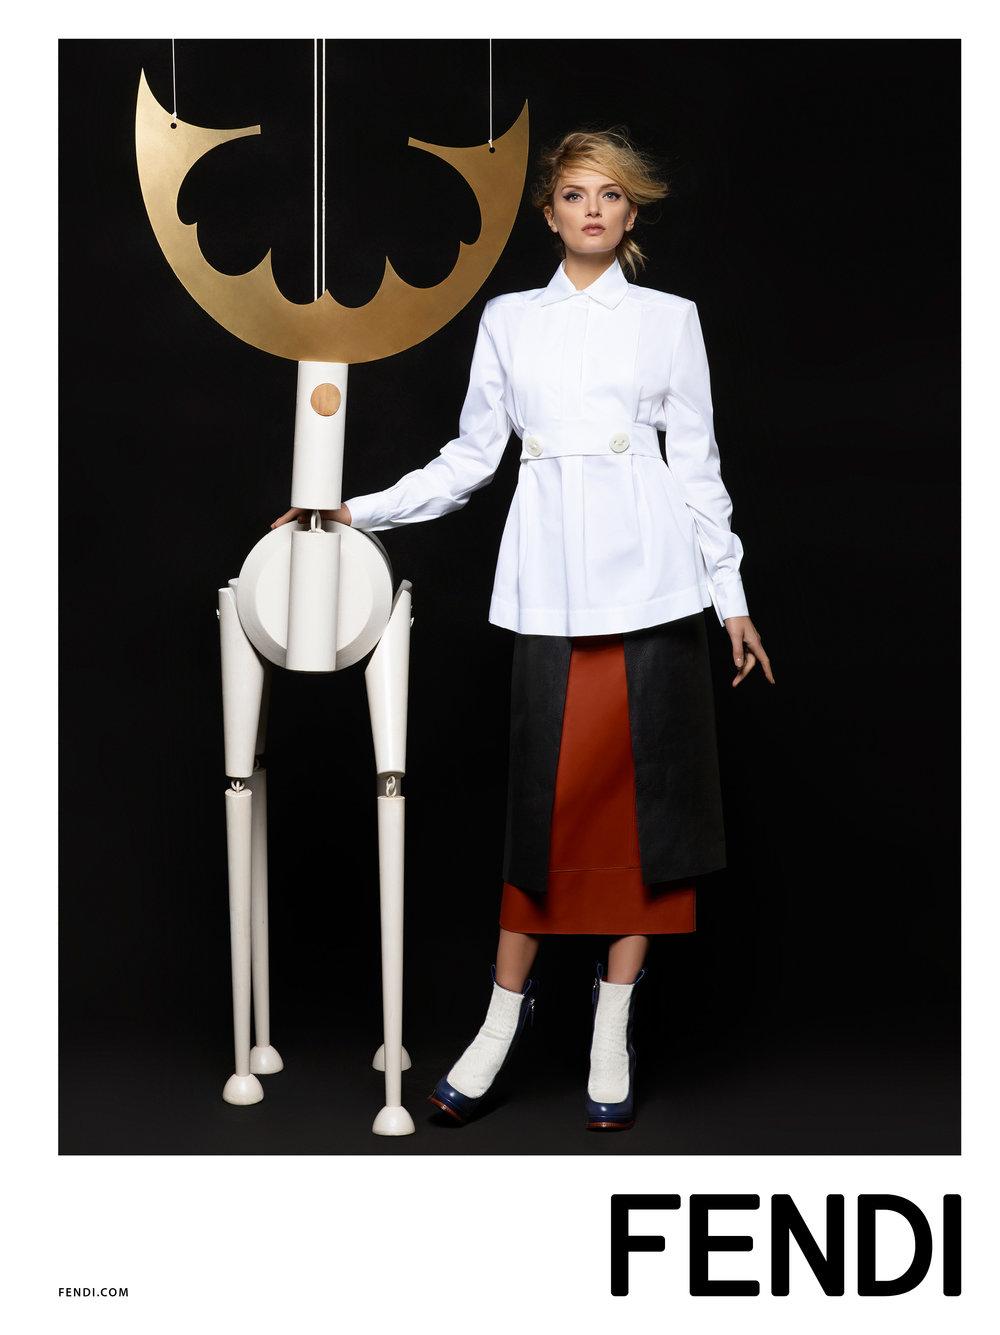 #fendi #karllagerfeld #fw15 #campaign #fashion #kendalljenner #lilydonaldson #charlottestockdale #amandaharlech #jimkaemmerling #peterphillips #sammcknight